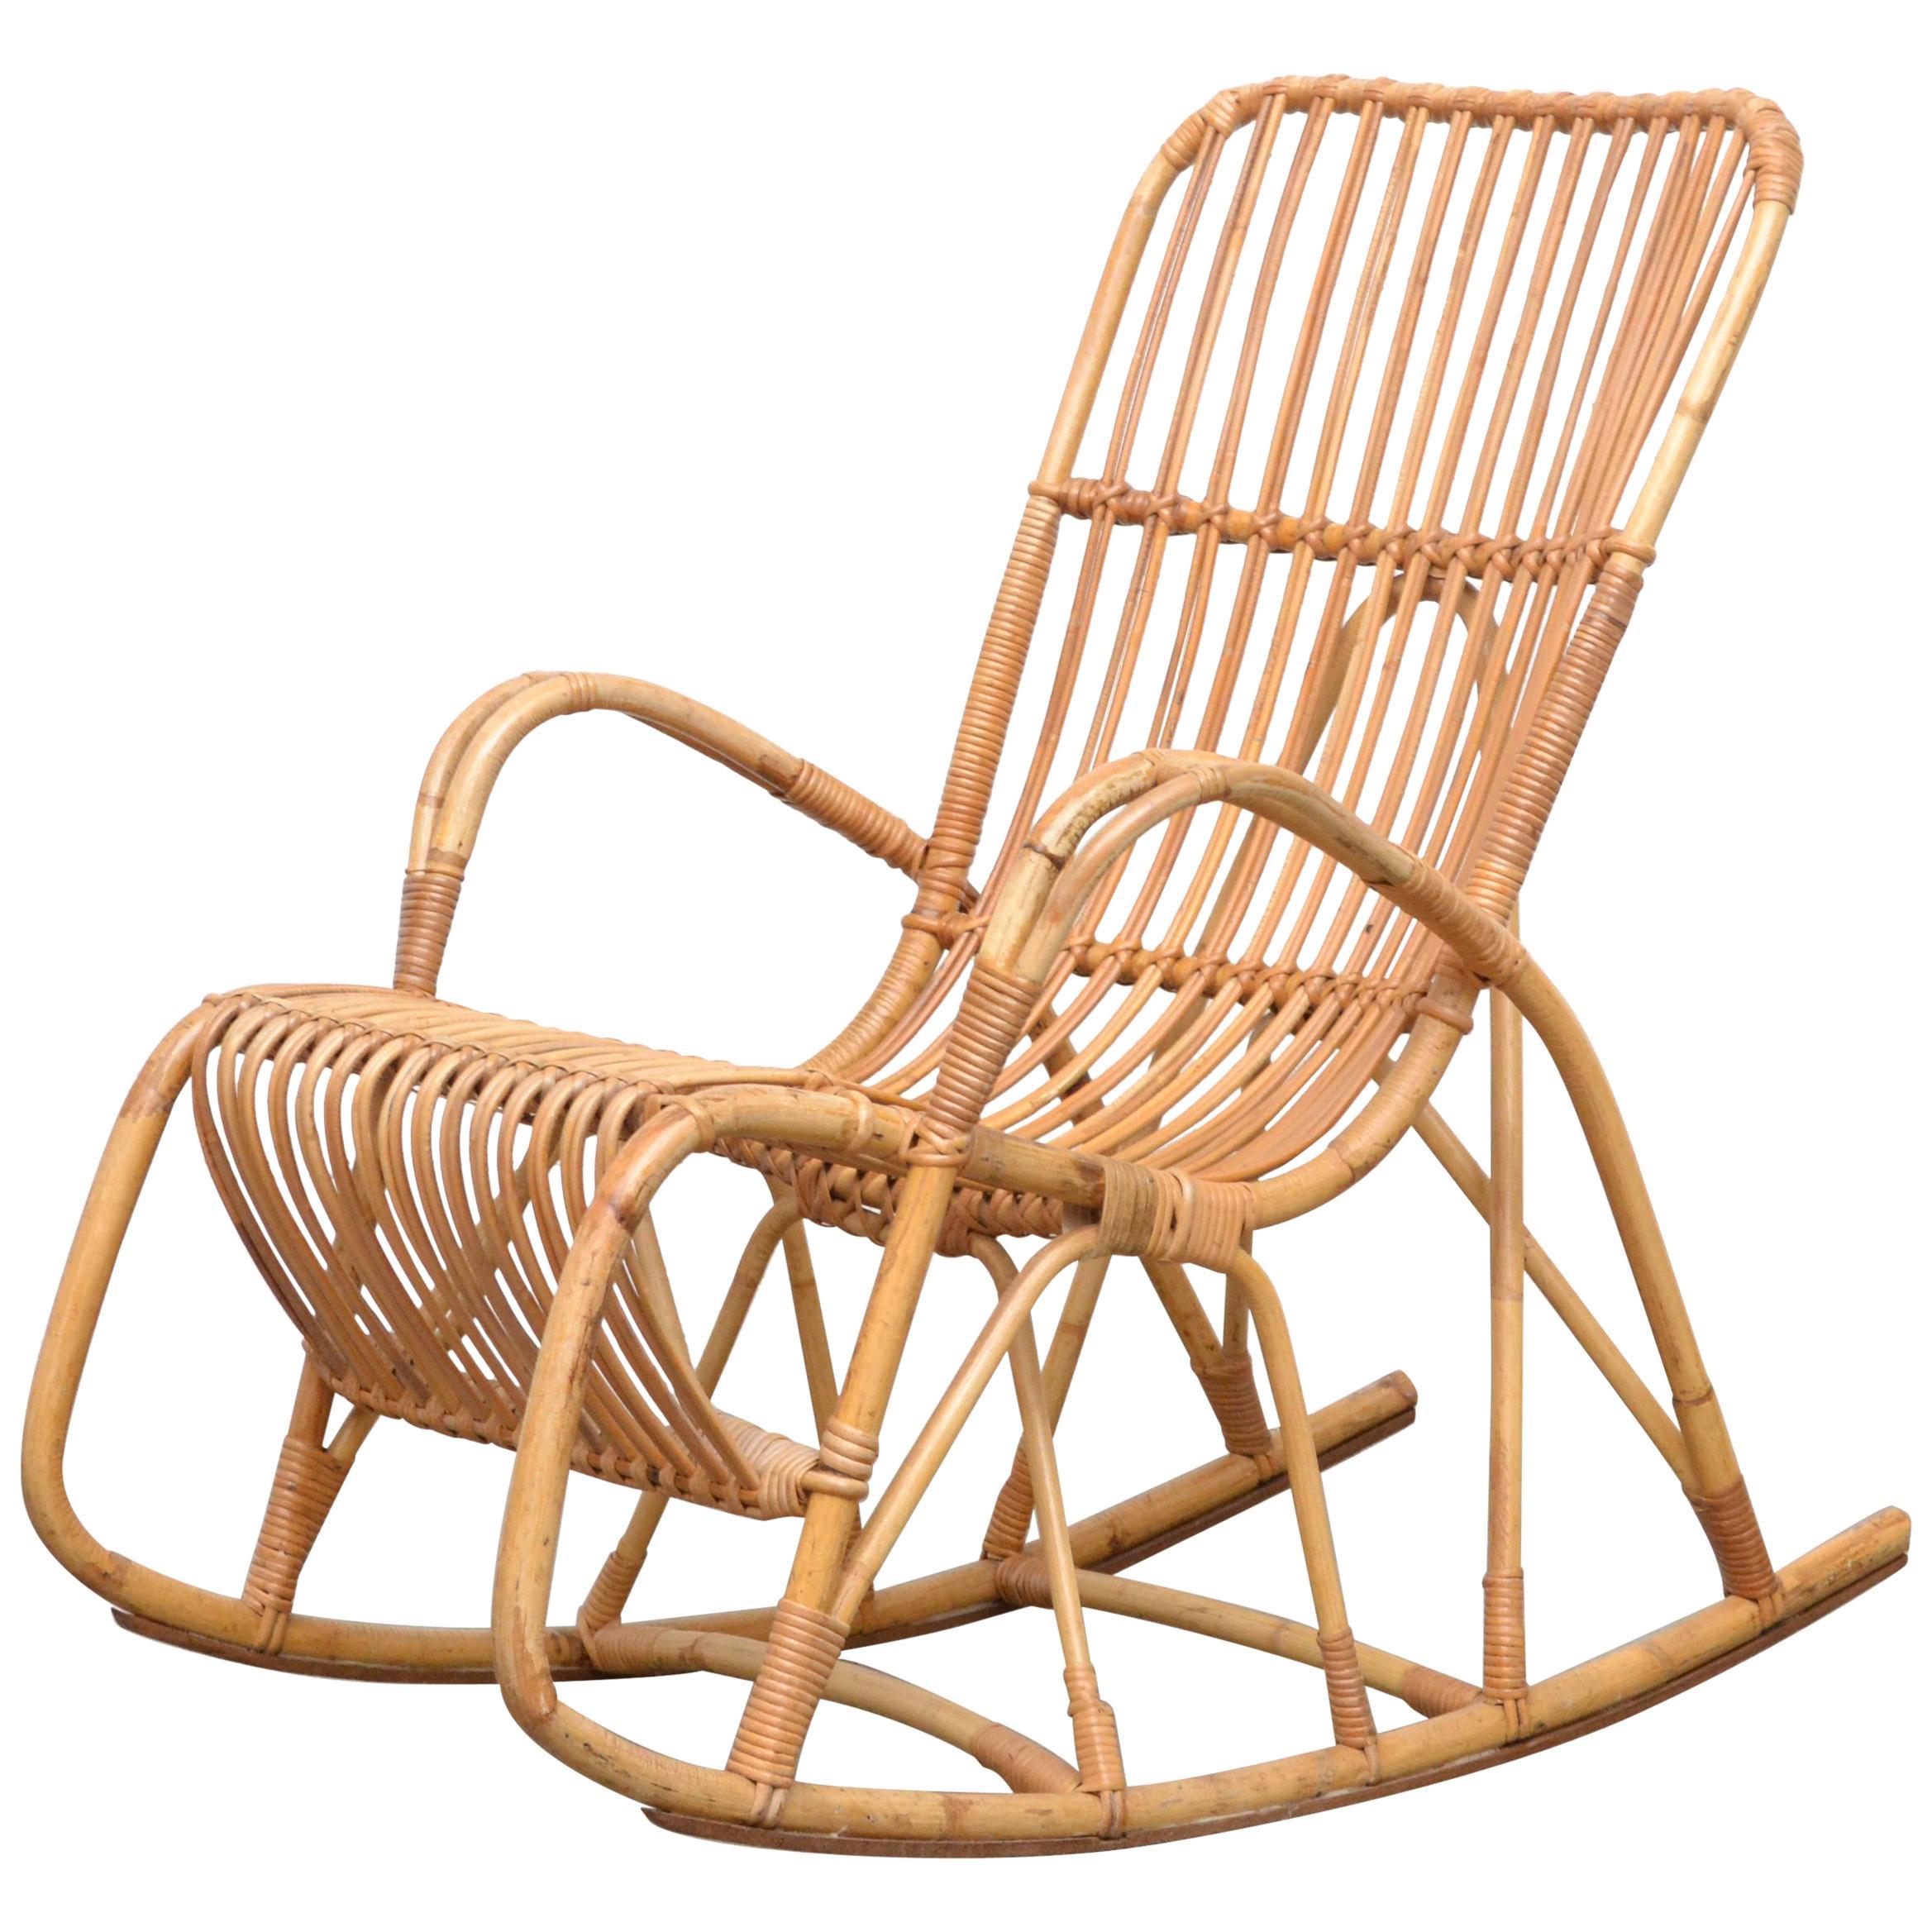 Rohe Noordwolde Bamboo Rocking Chair